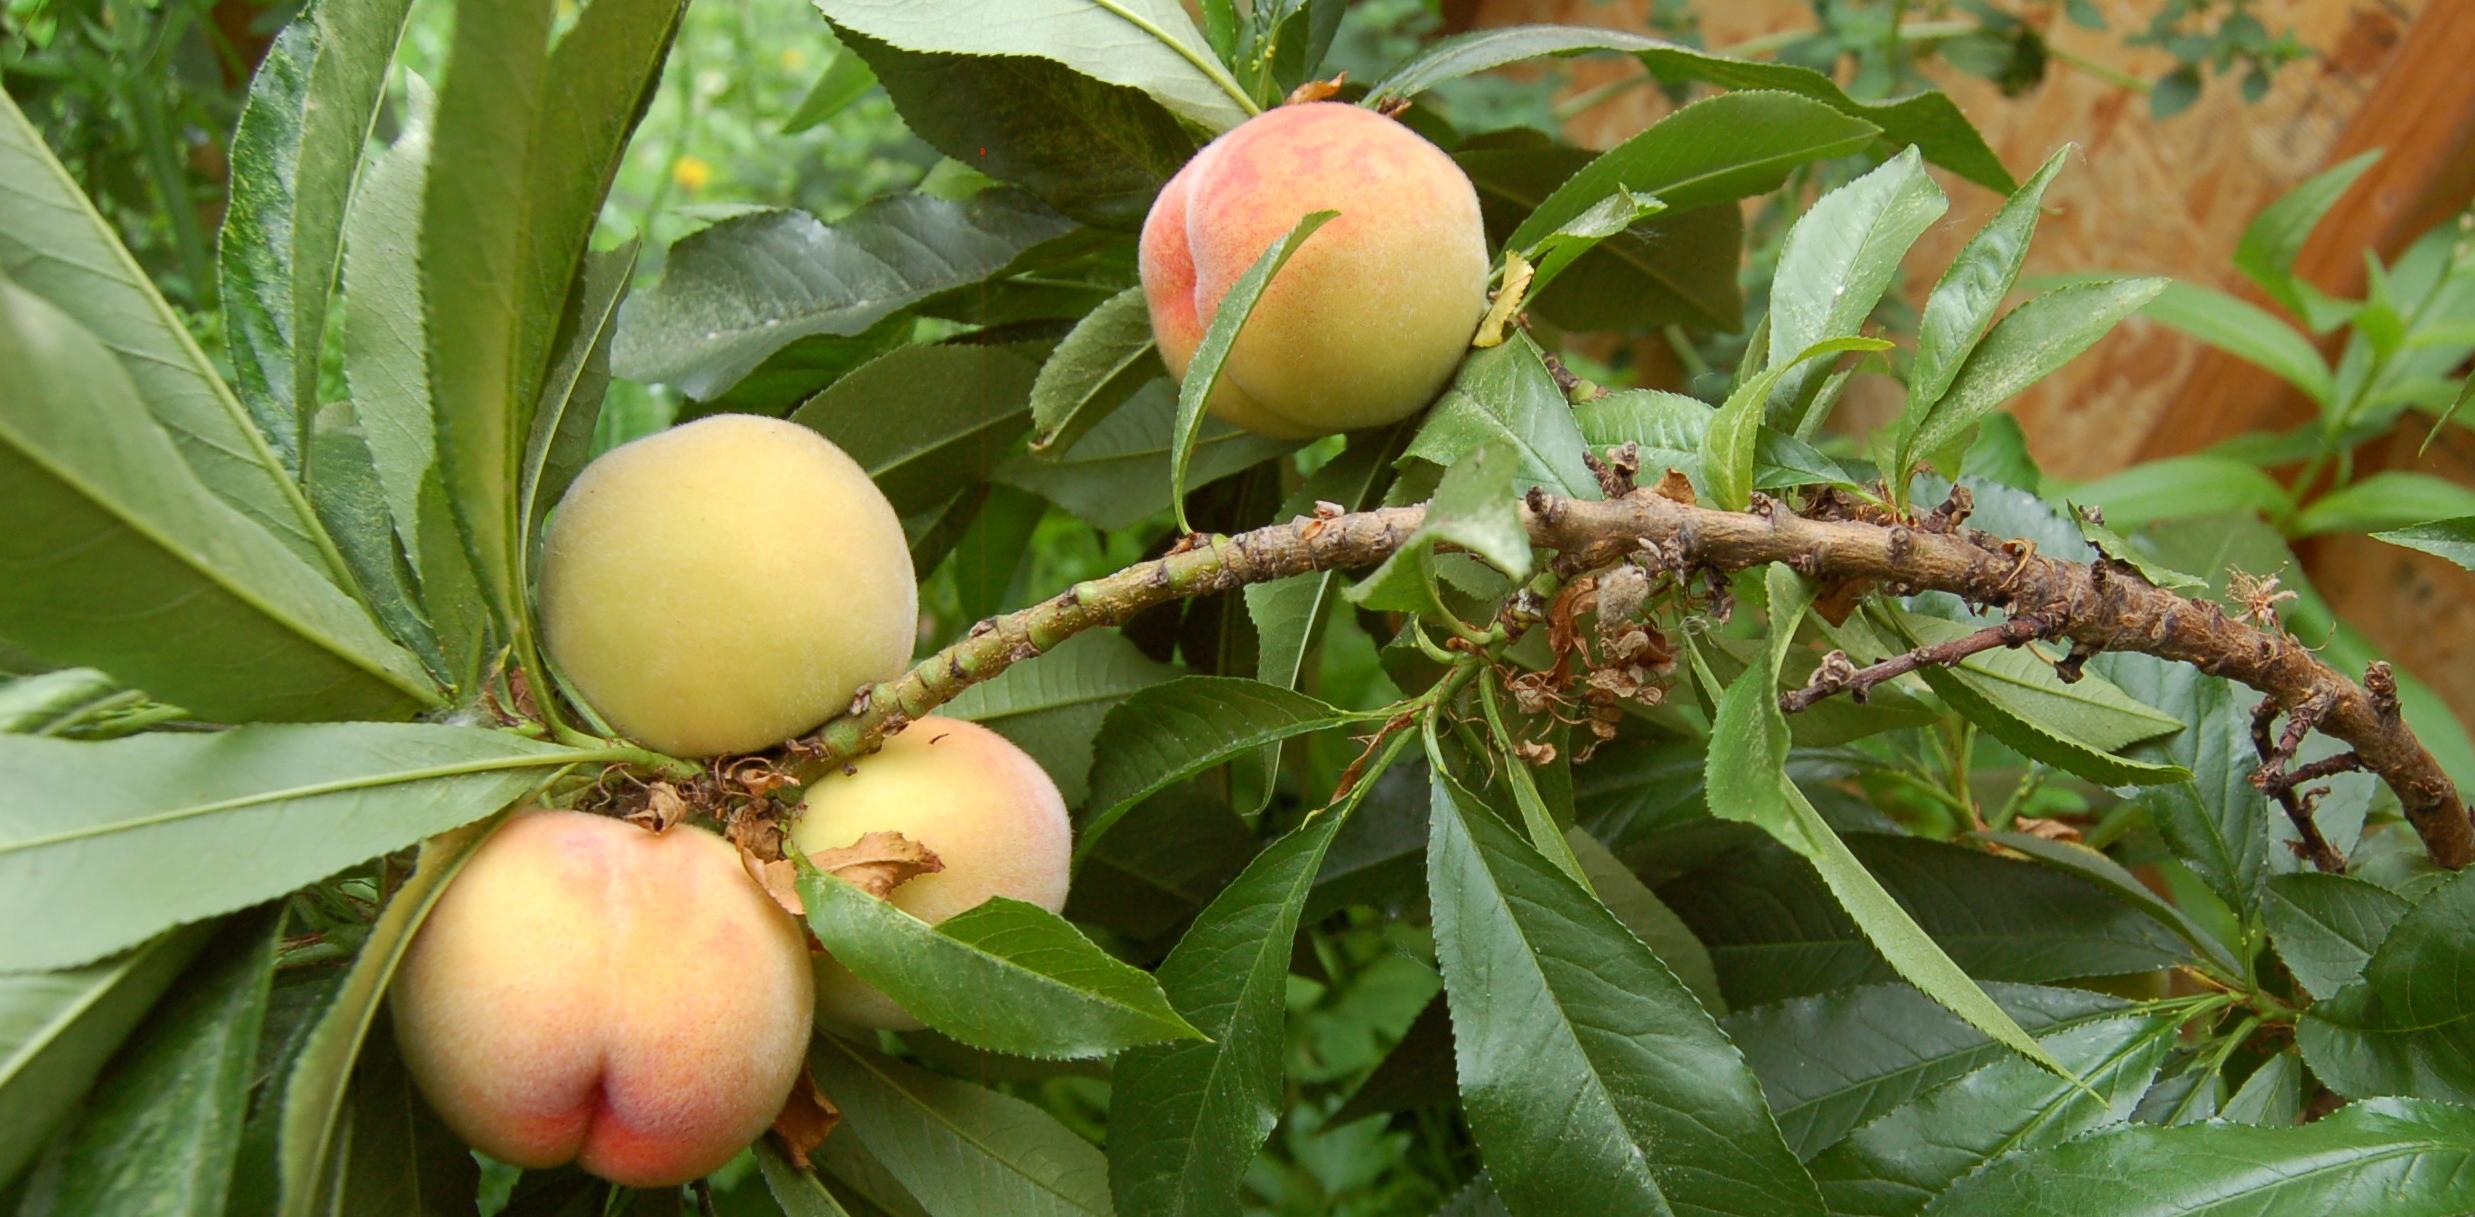 Pretty as a peach | The 10 Year Challenge